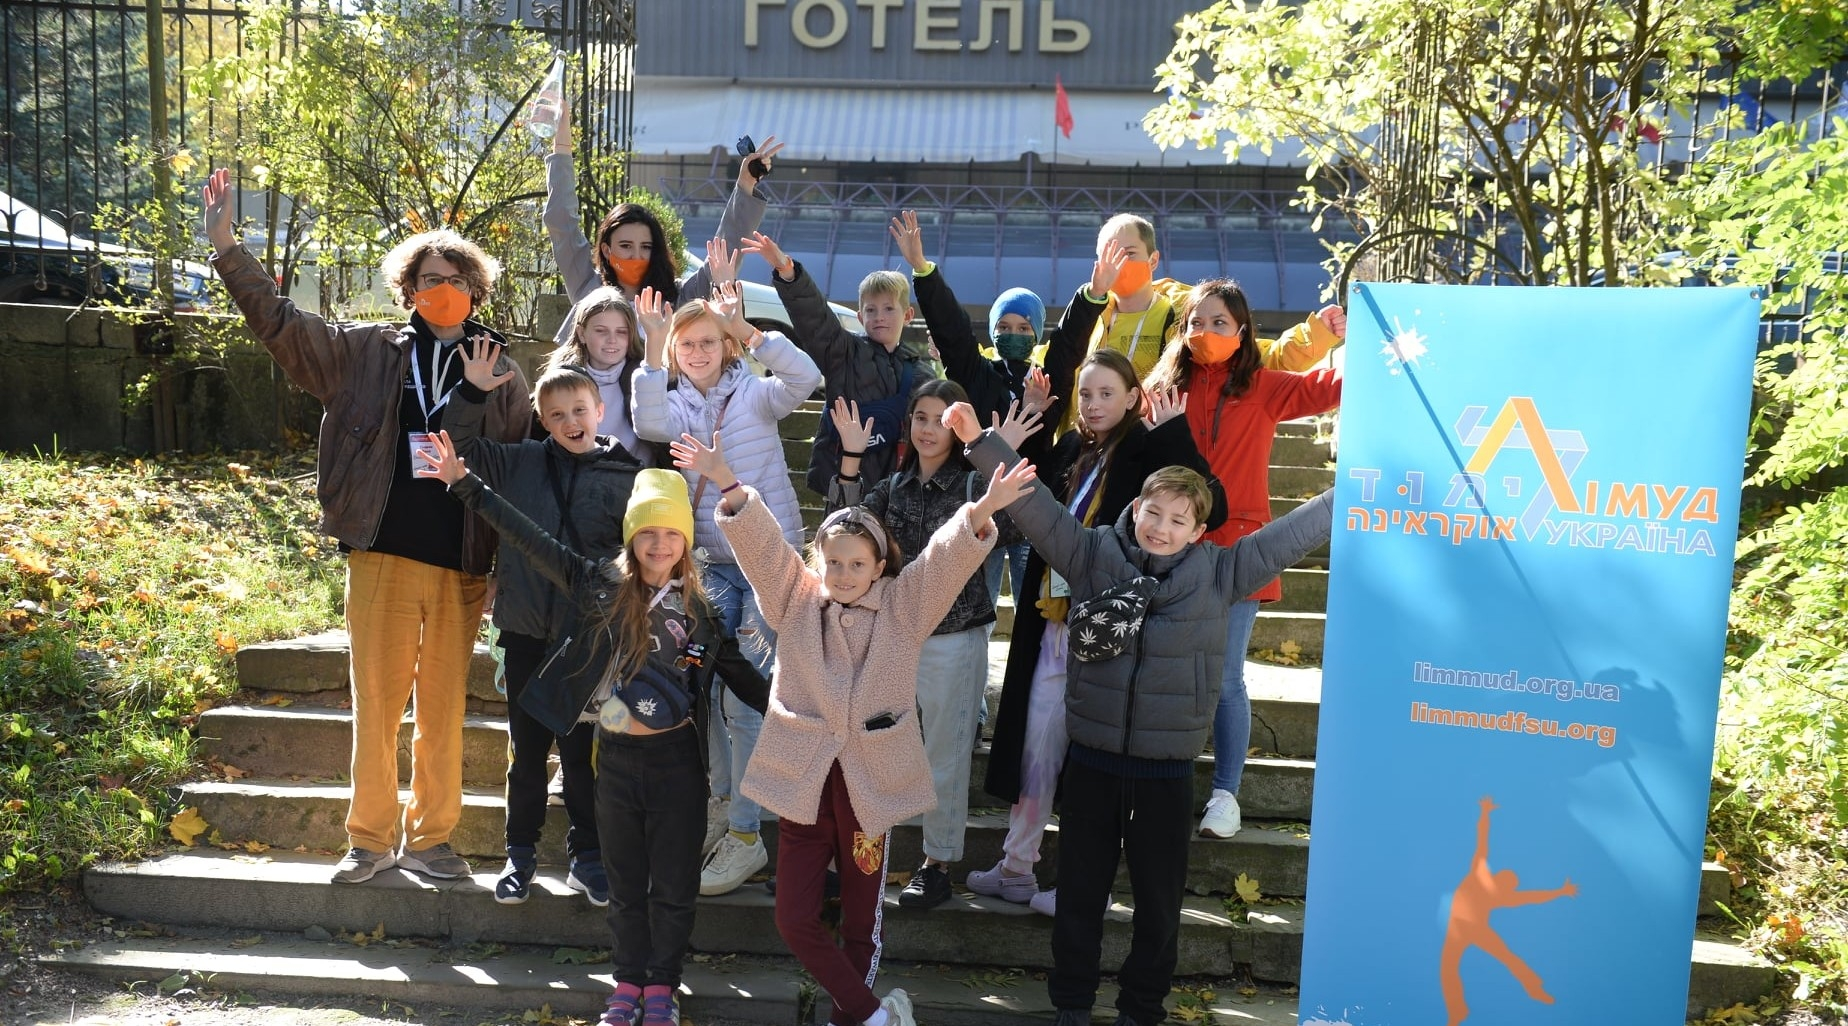 Ukraine Jews find cause to celebrate despite country's challenges